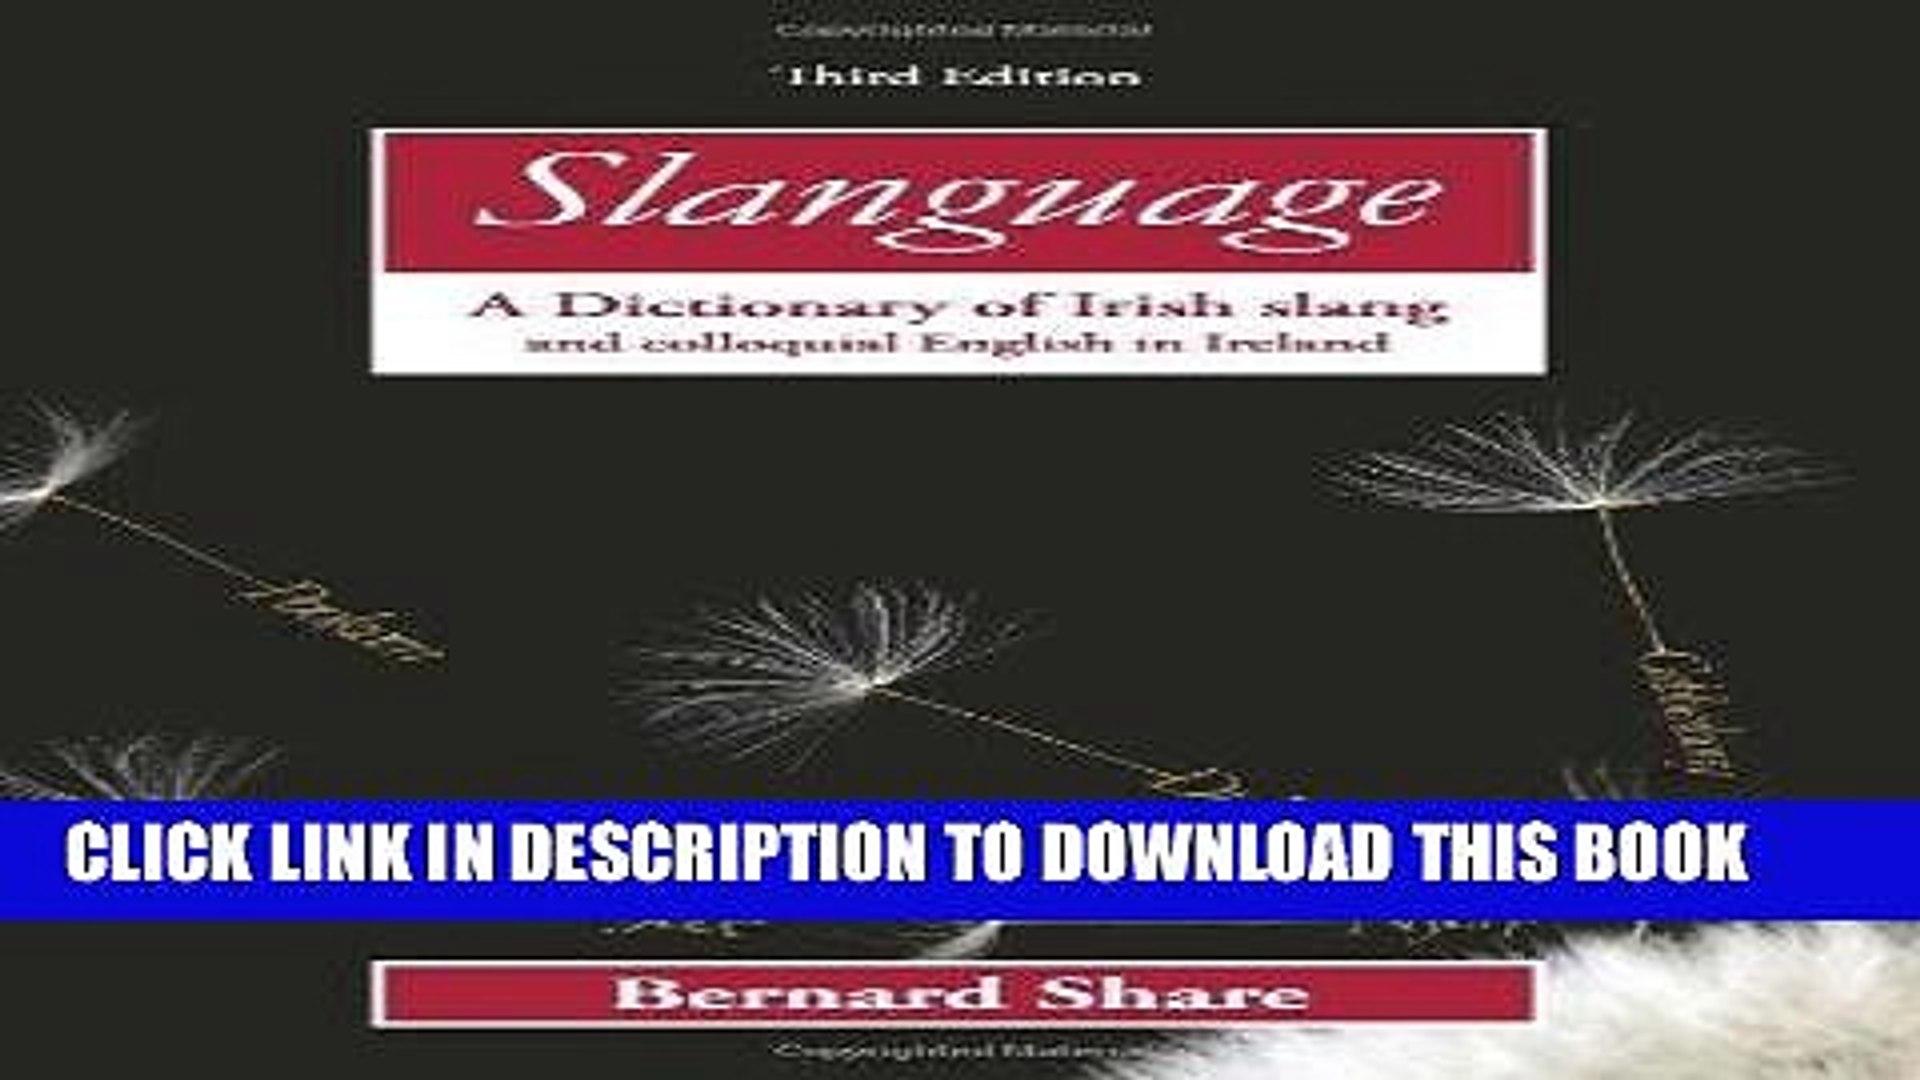 Slanguage A Dictionary of Irish Slang and colloquial English in Ireland